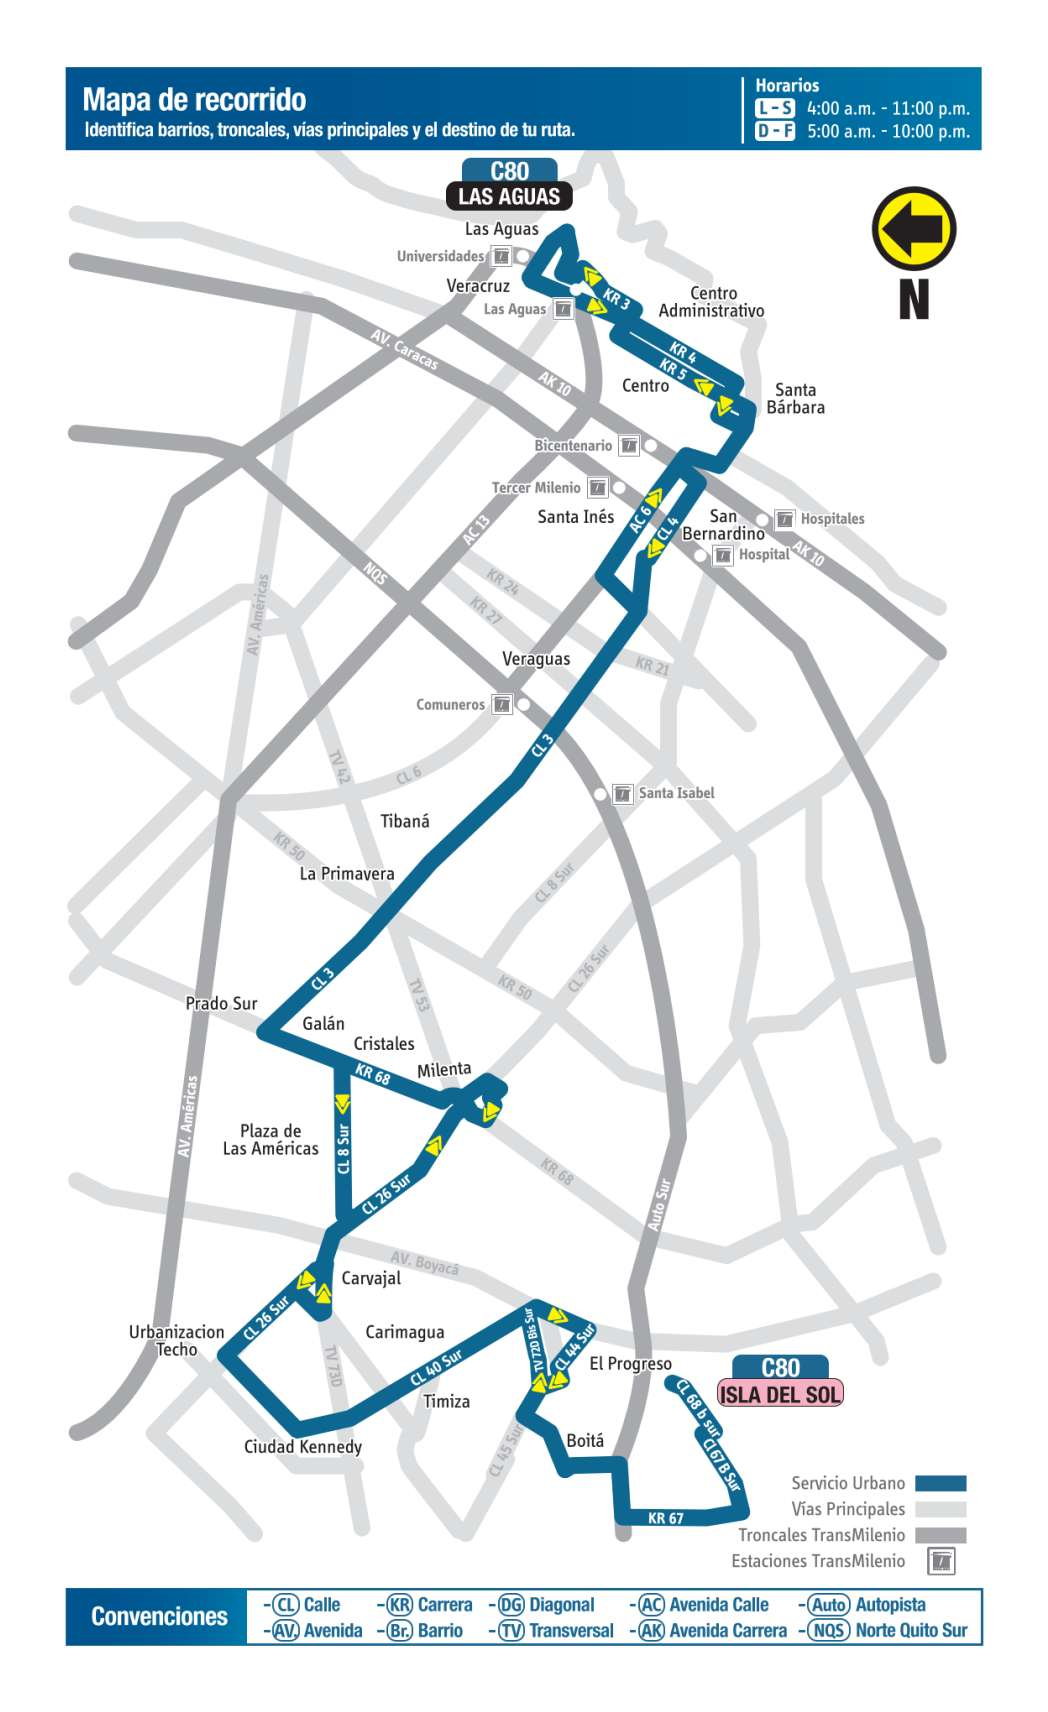 C80 Isla del Sol - Las Aguas, mapa bus urbano Bogotá